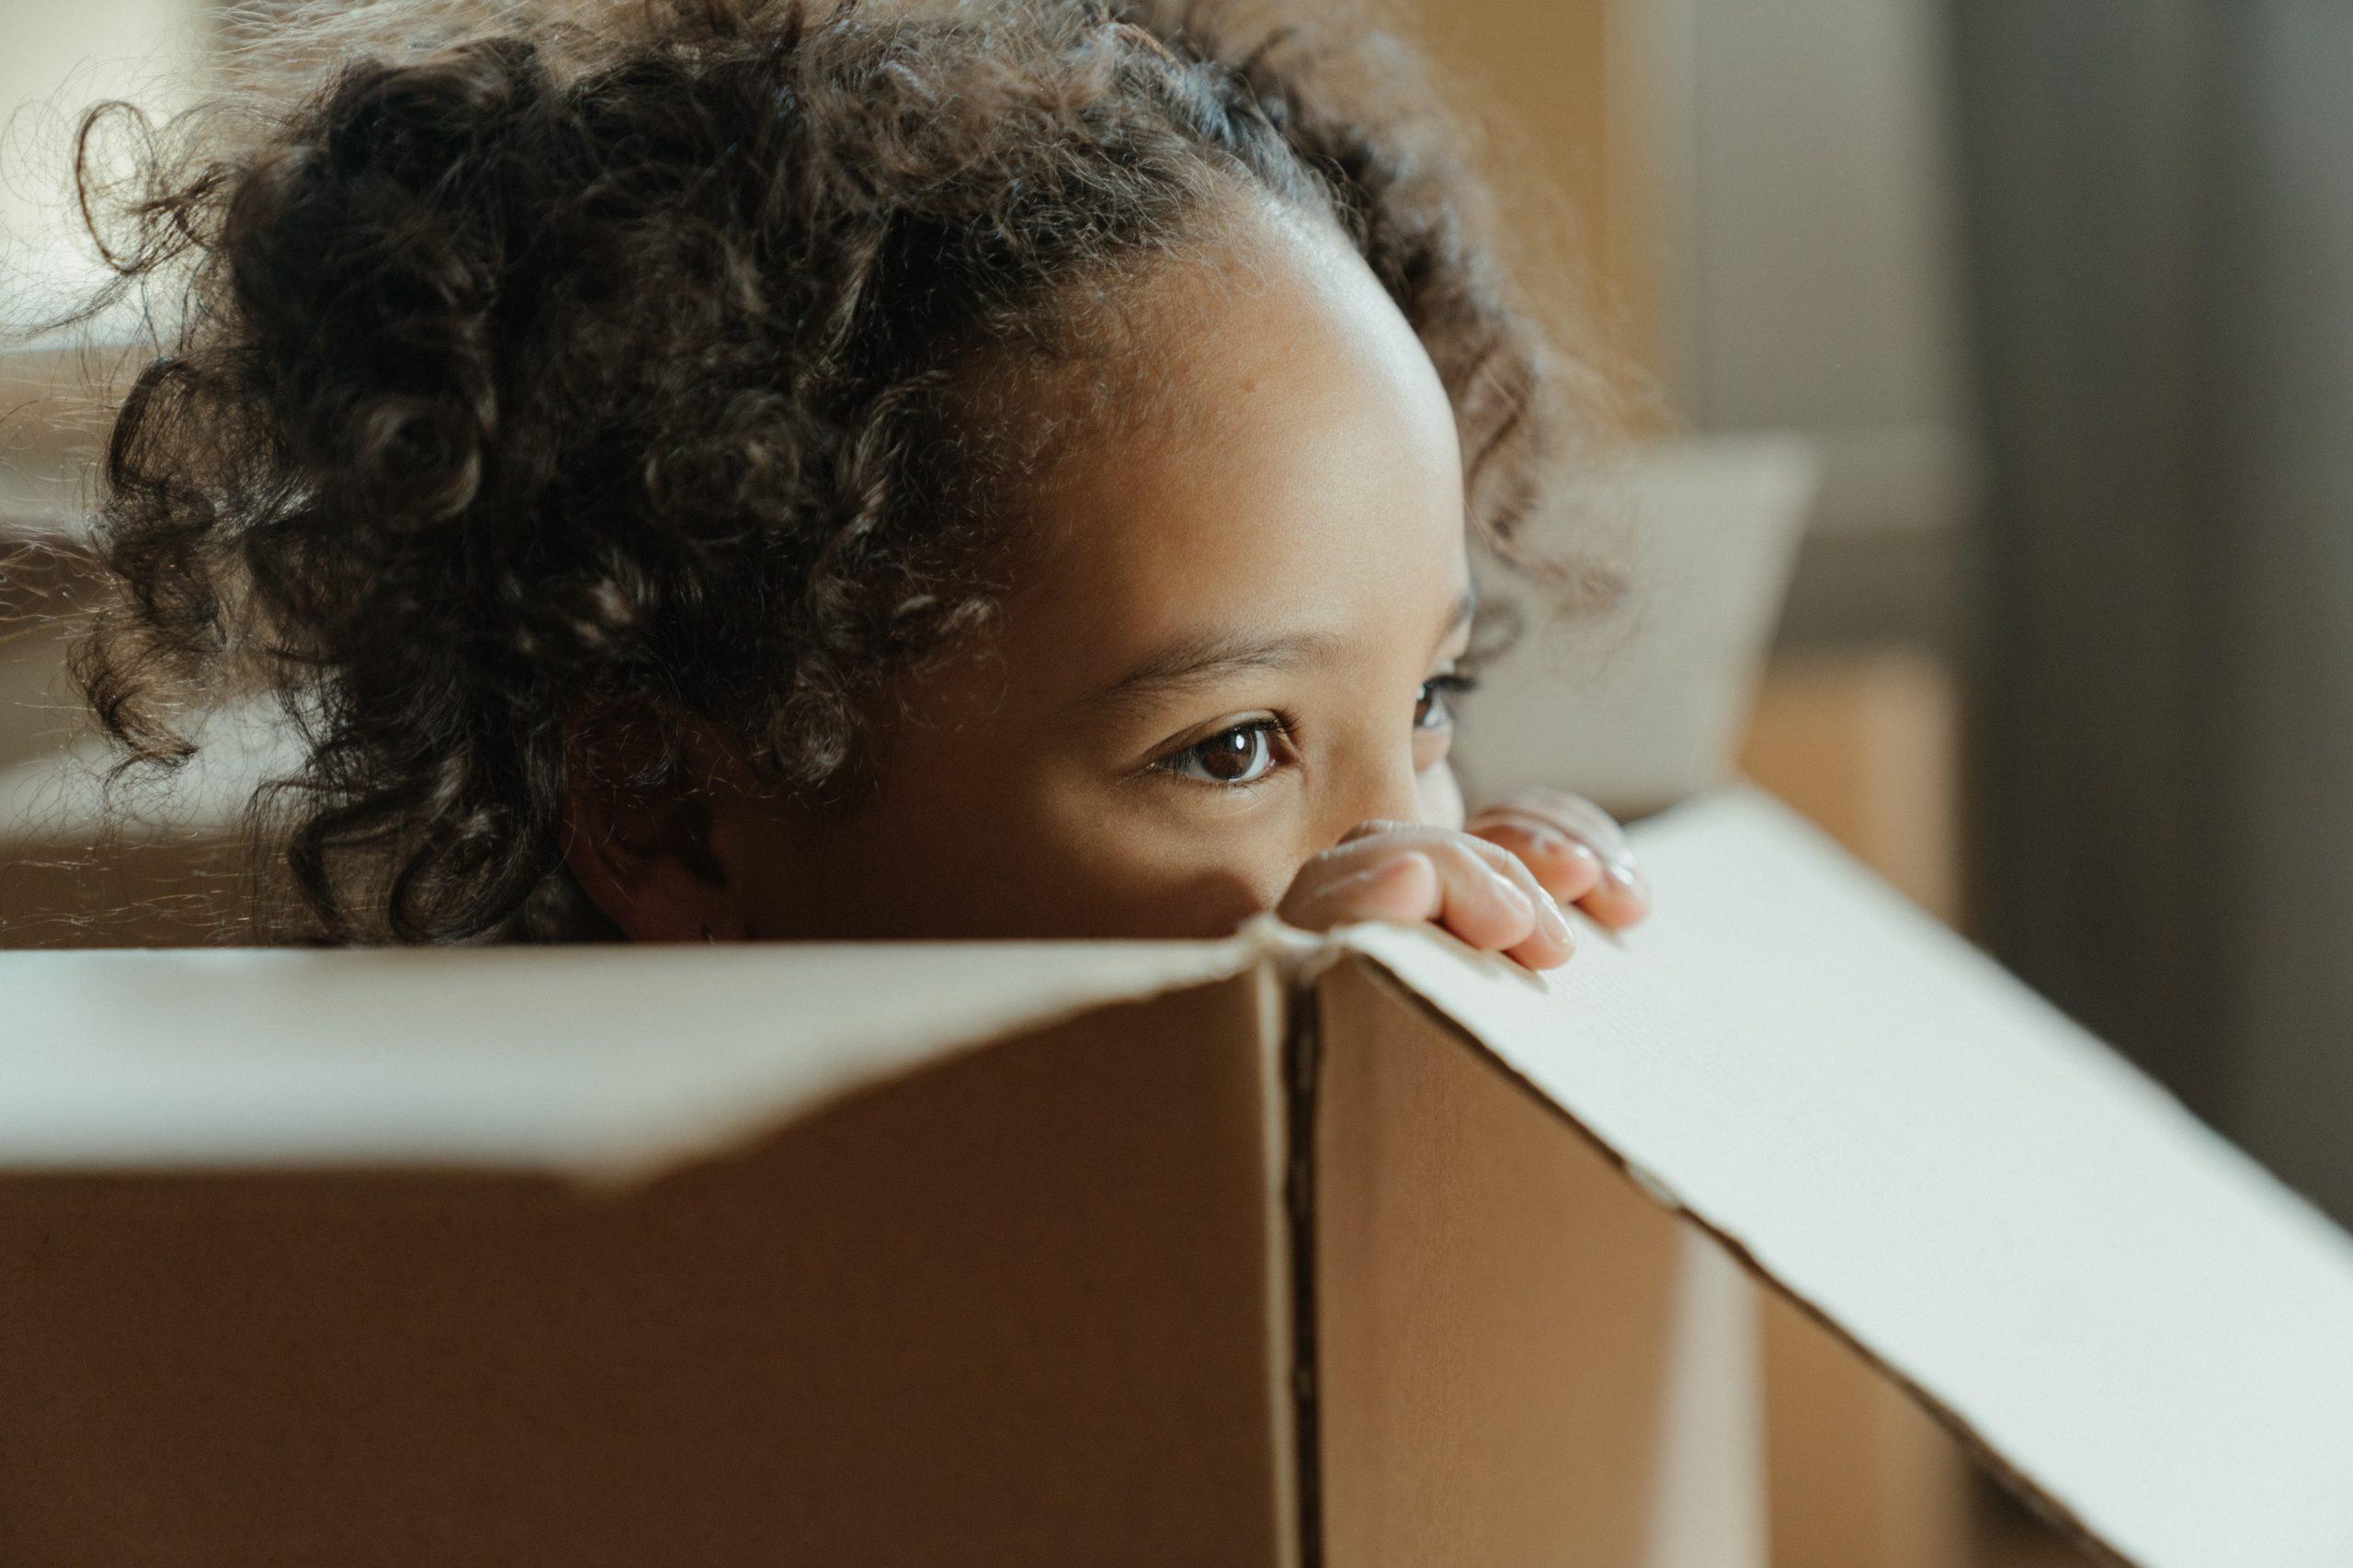 Little girl in a cardboard box